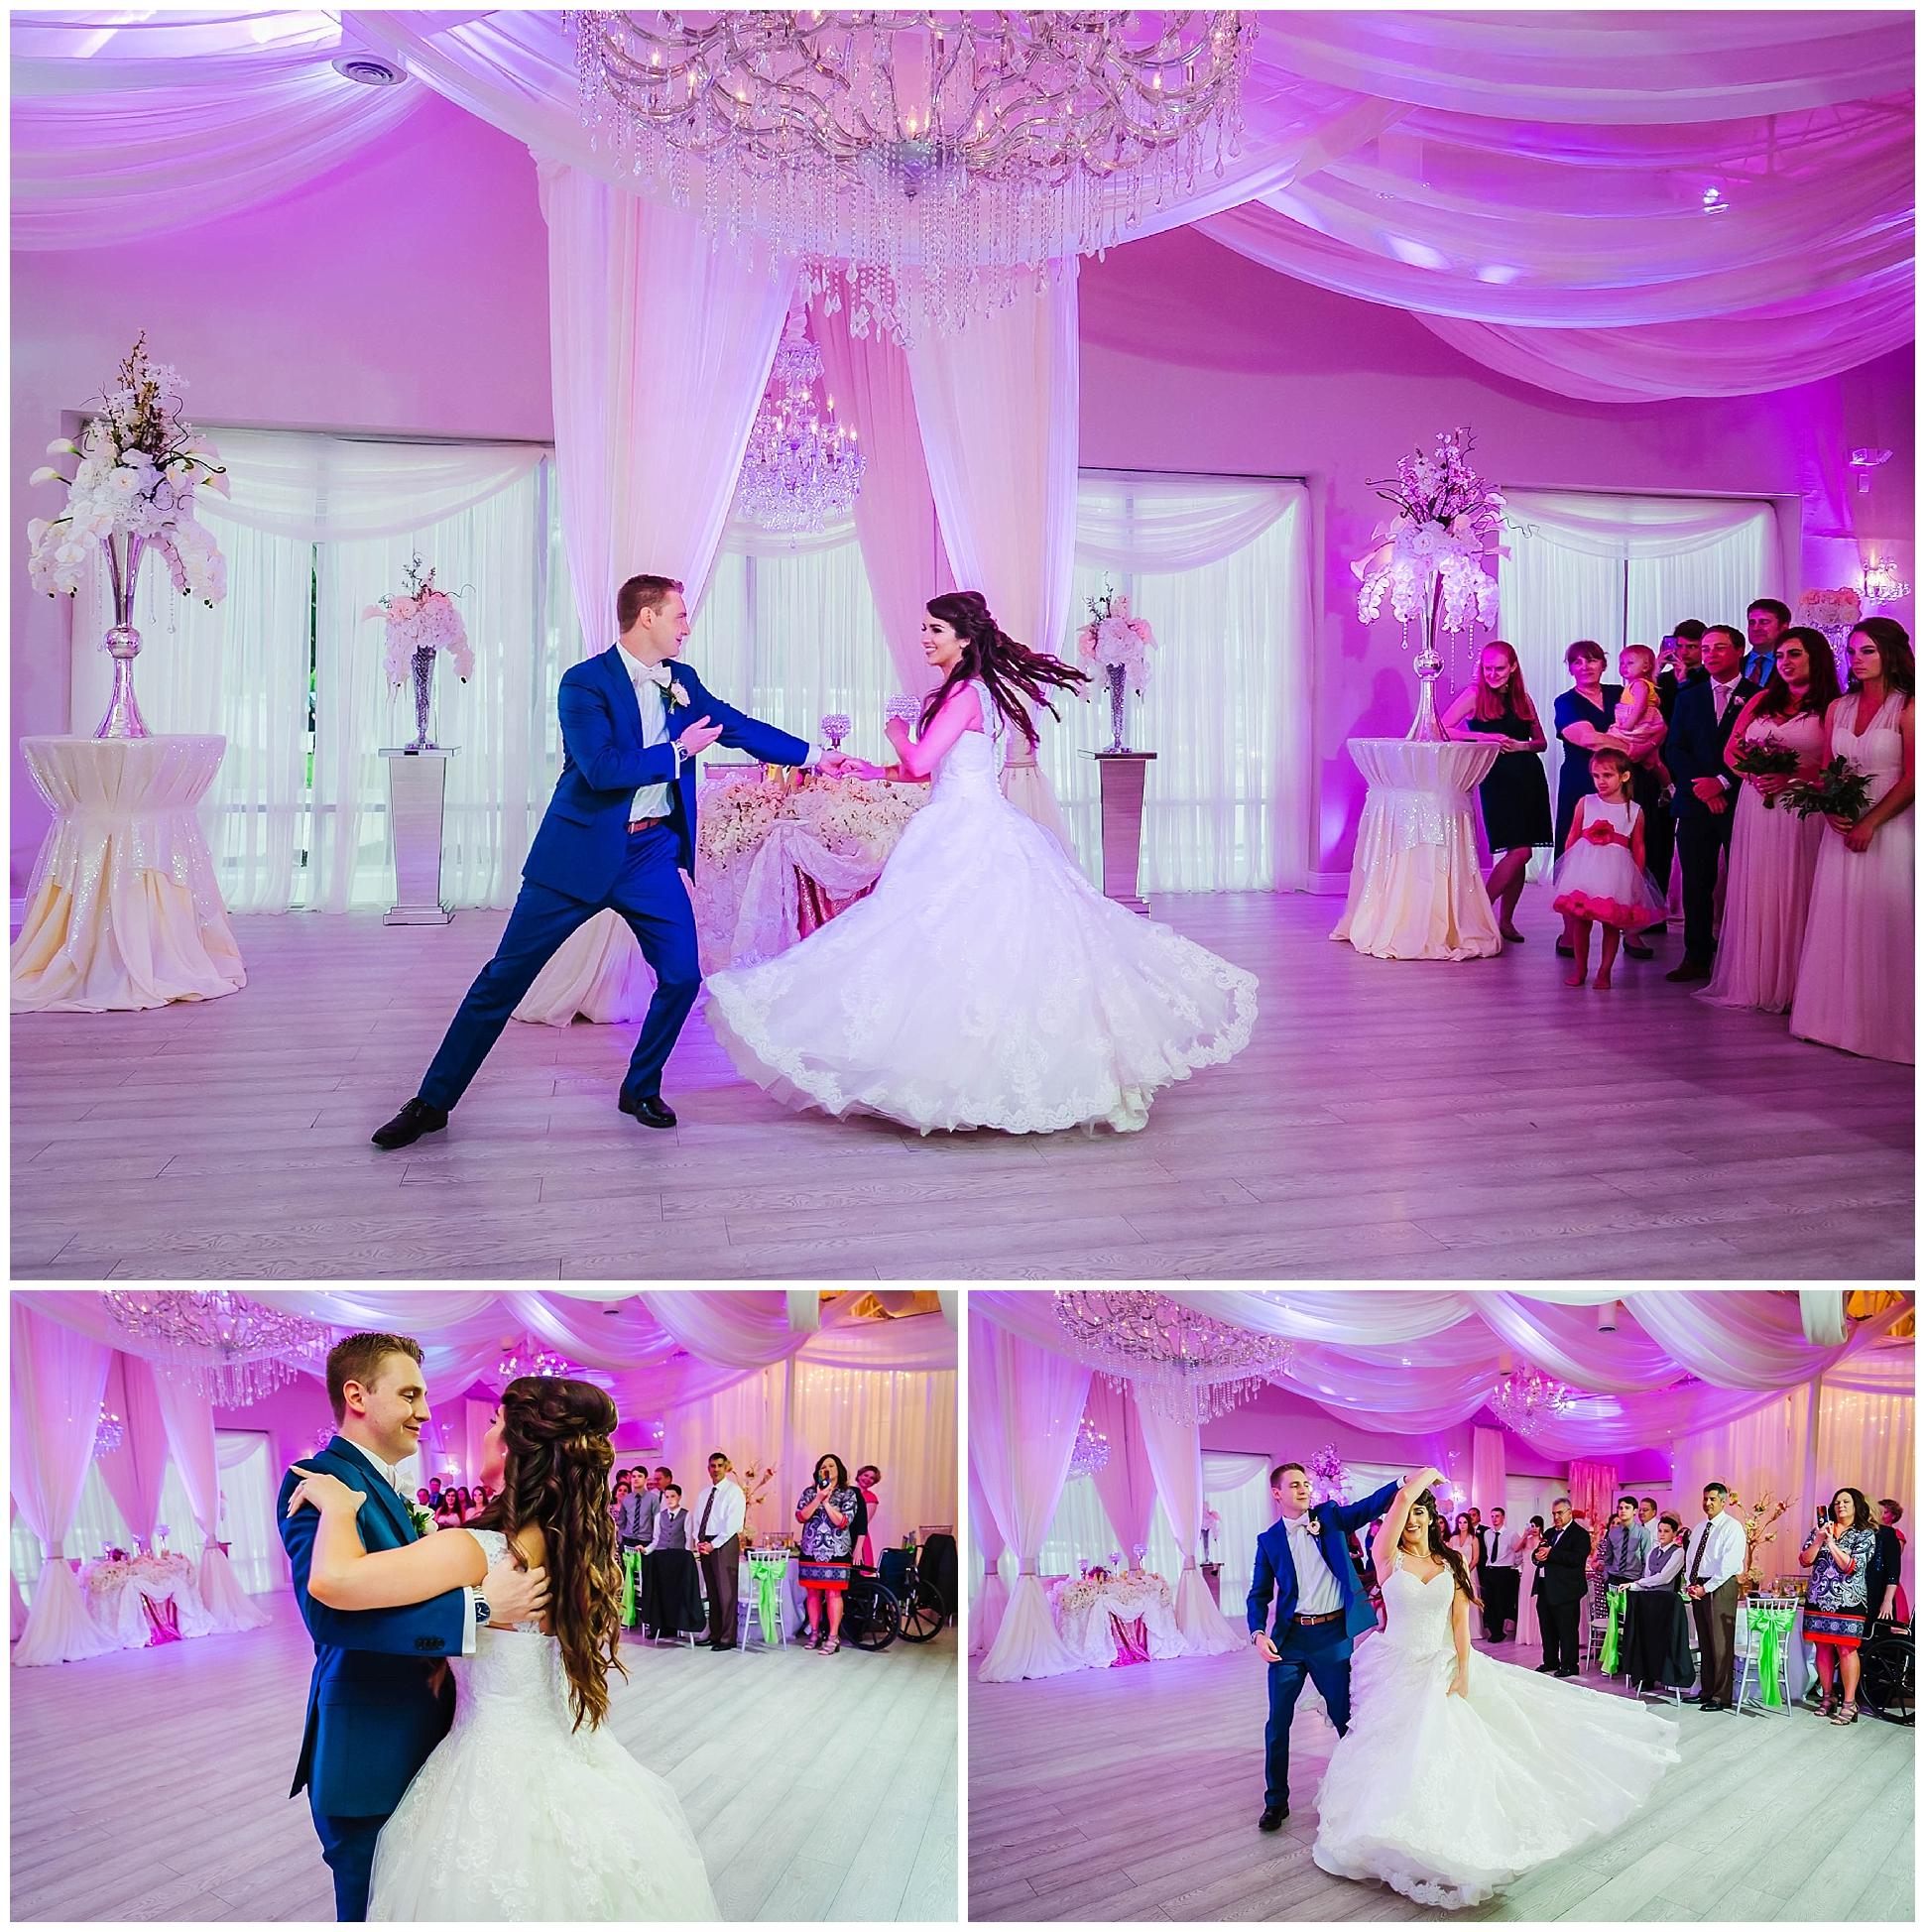 st-pete-wedding-photographer-sunken-gardens-crystal-ballroom-princess-dancer_0188.jpg